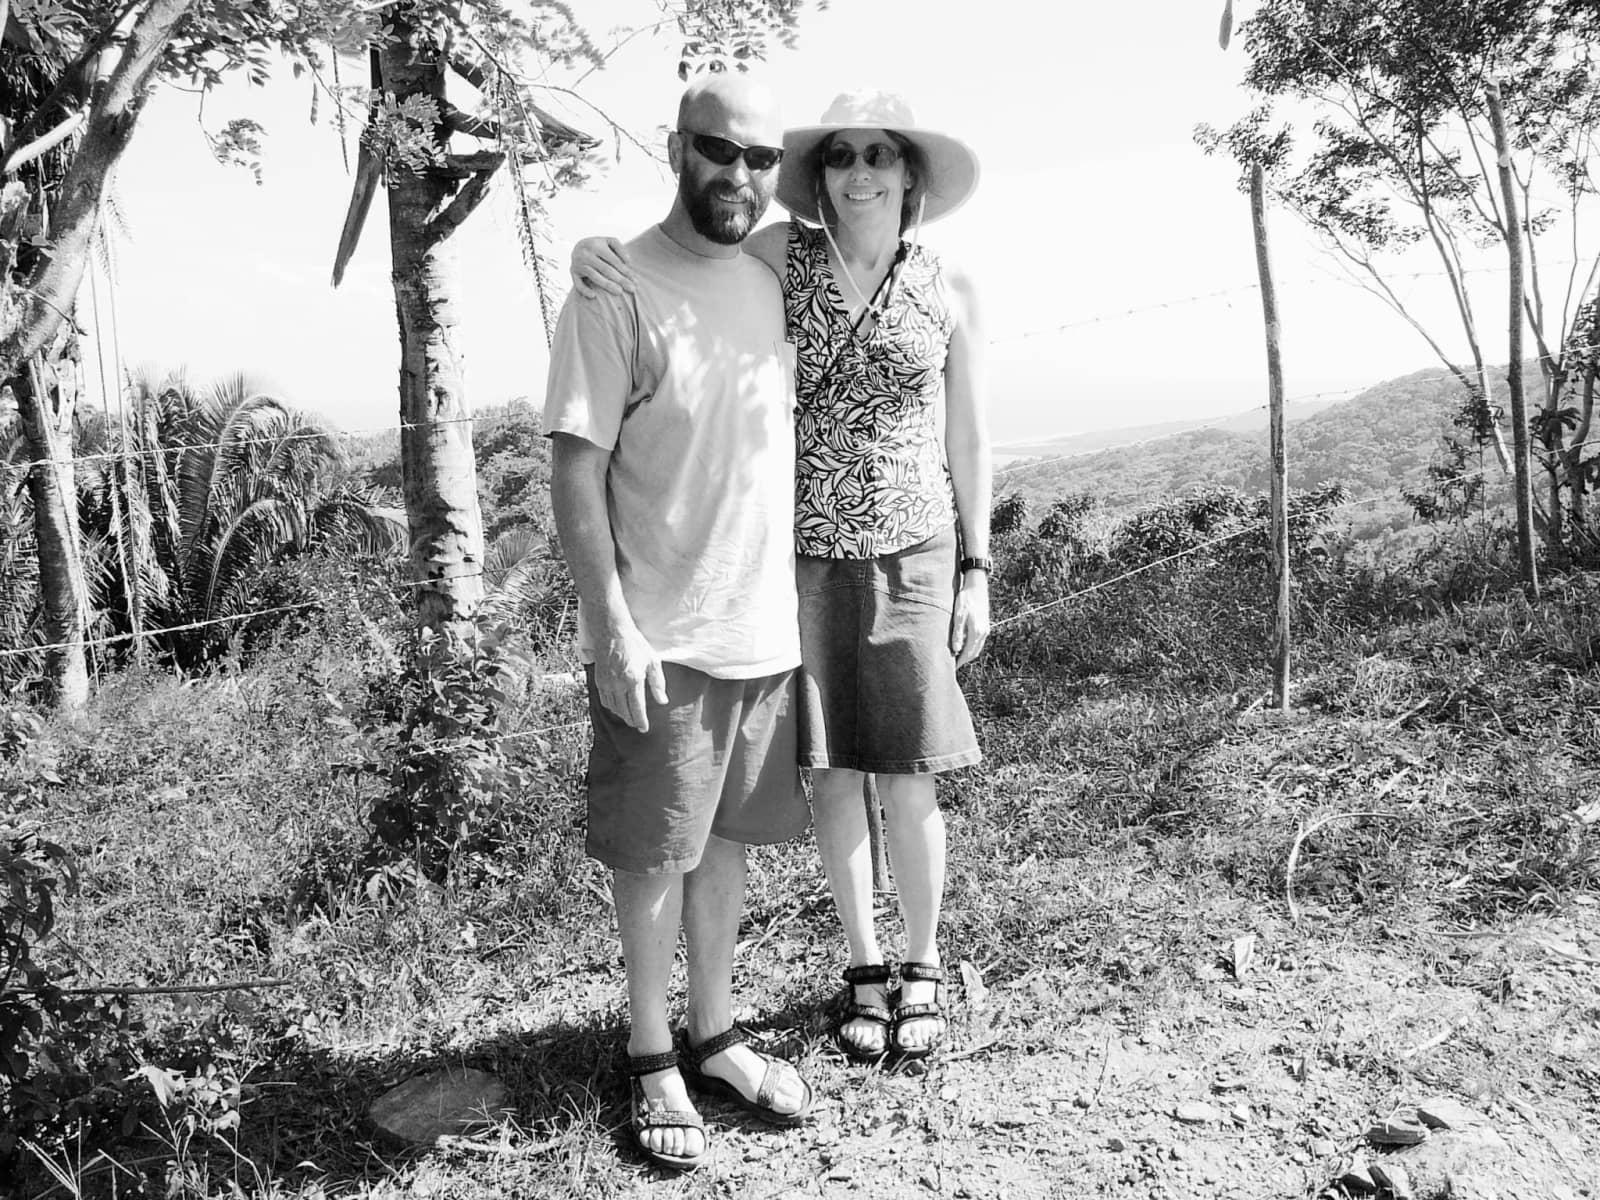 Kelly and stephen & Stephen from Bellingham, Washington, United States